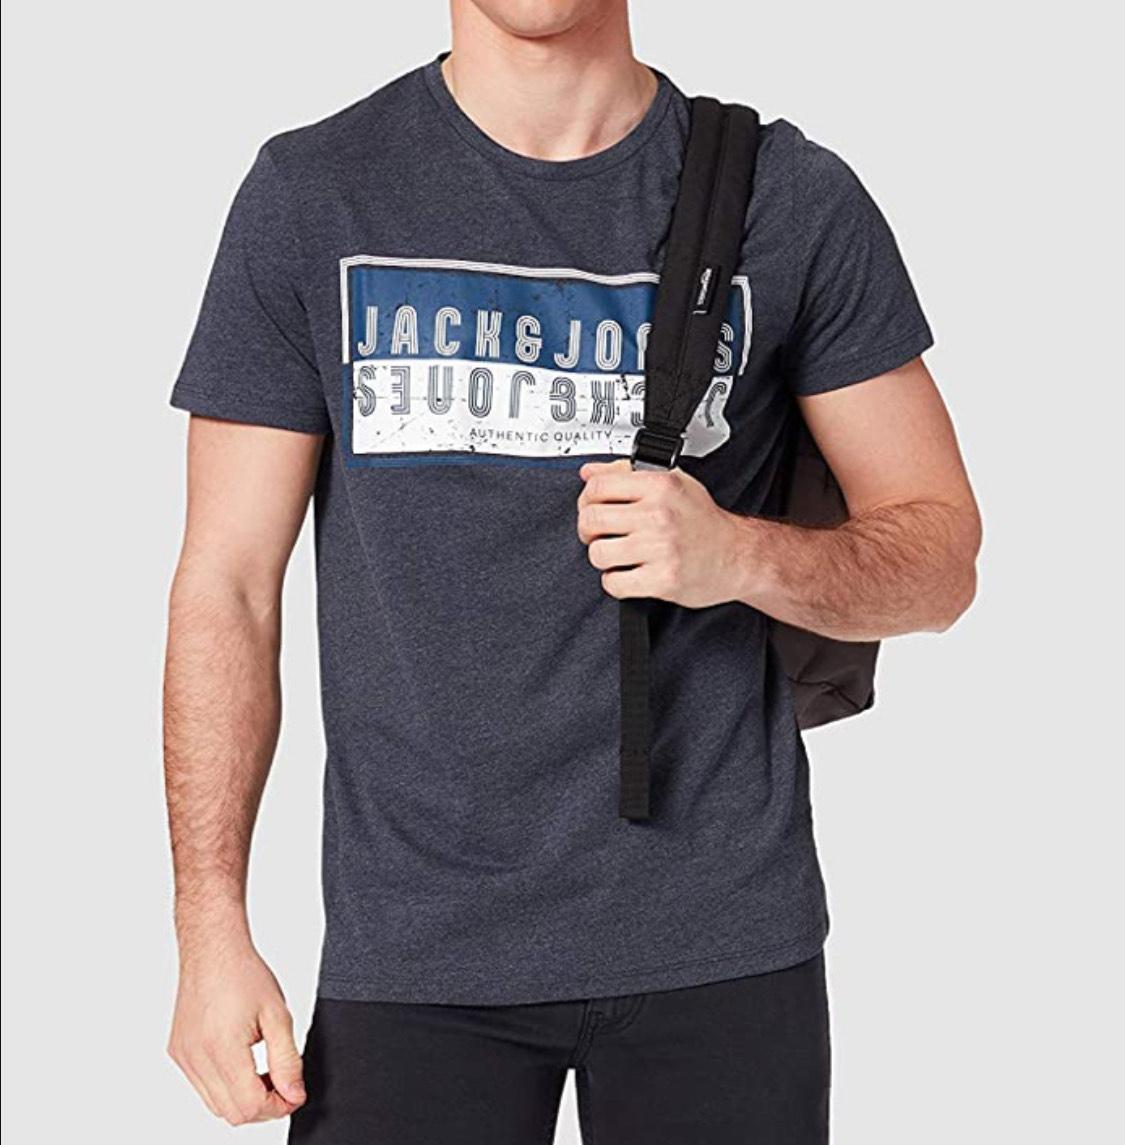 Camiseta Jack & Jones adulto talla XL (L a 7,68€)